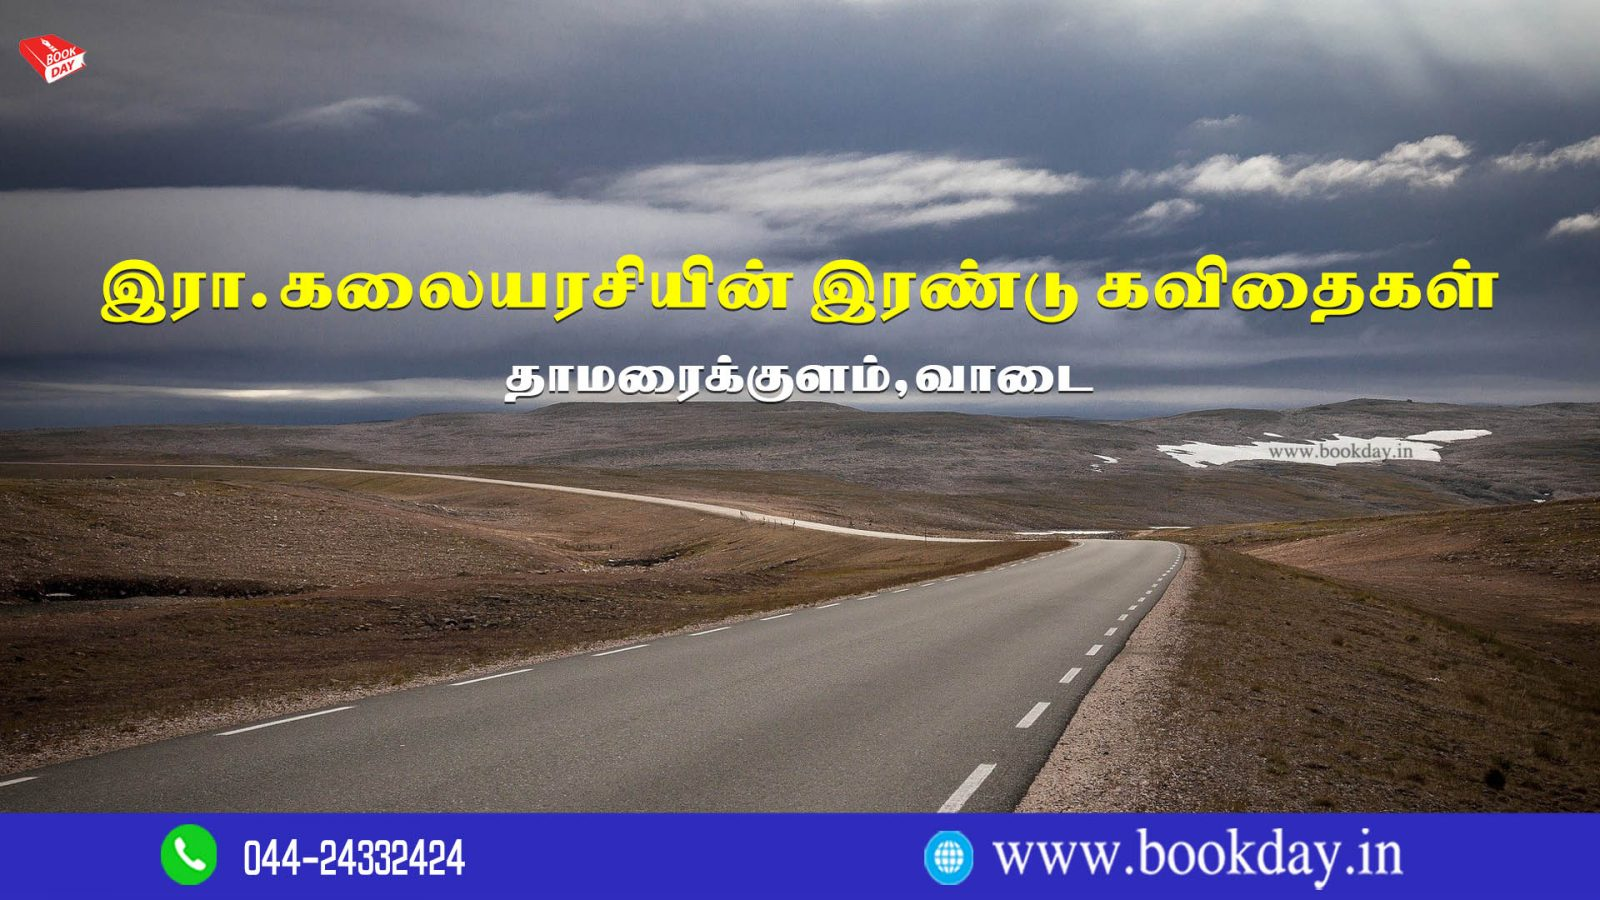 Era. Kalaiarasi Writes Two Poetries in Tamil Language. இரா. கலையரசியின் இரண்டு கவிதைகள் (தாமரைக்குளம், வாடை)